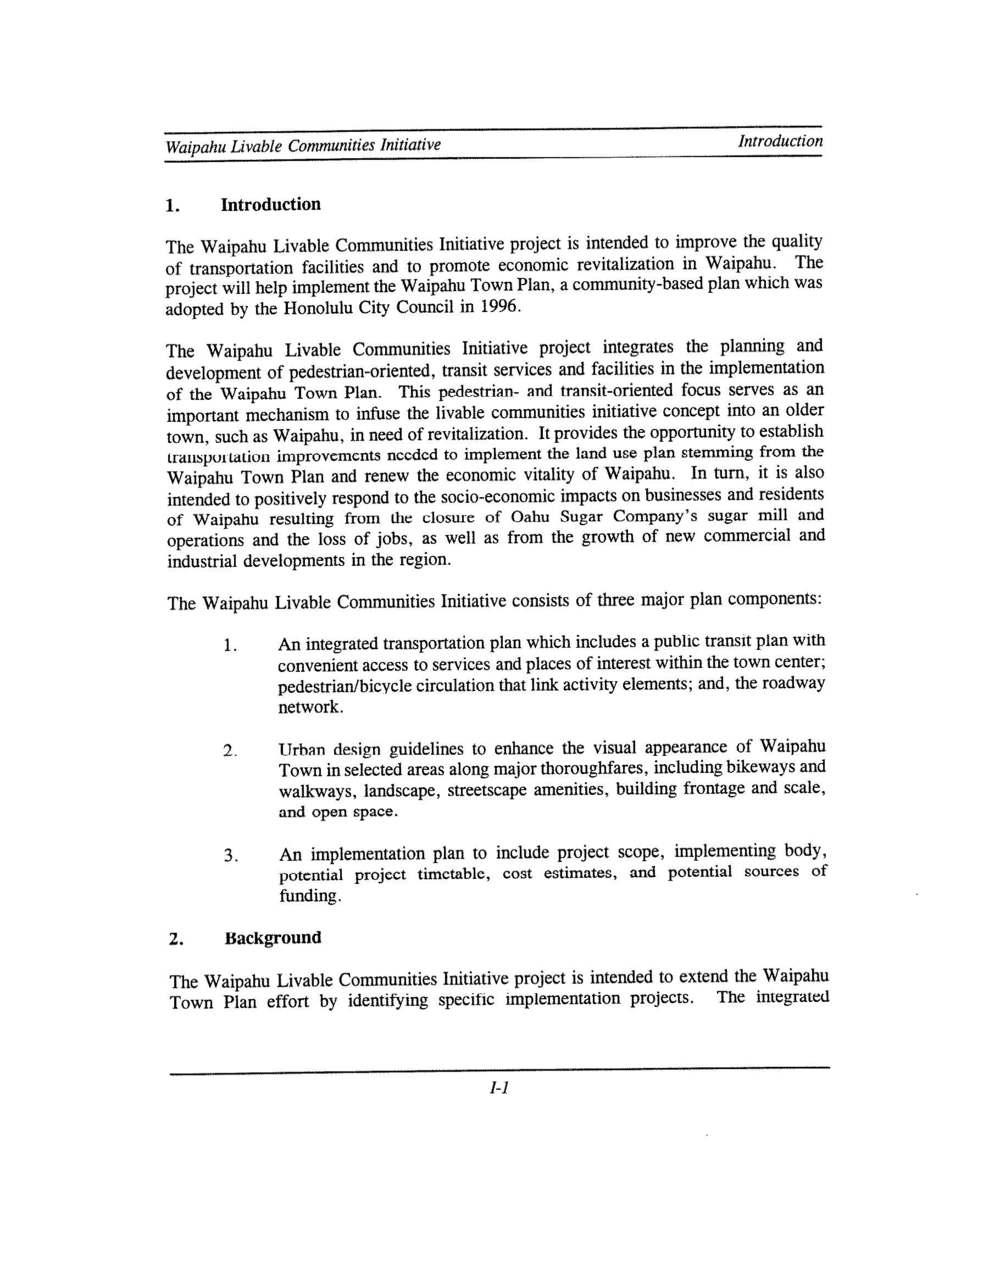 160531_WaipahuLivableCommunities(1998)_Page_009.jpg